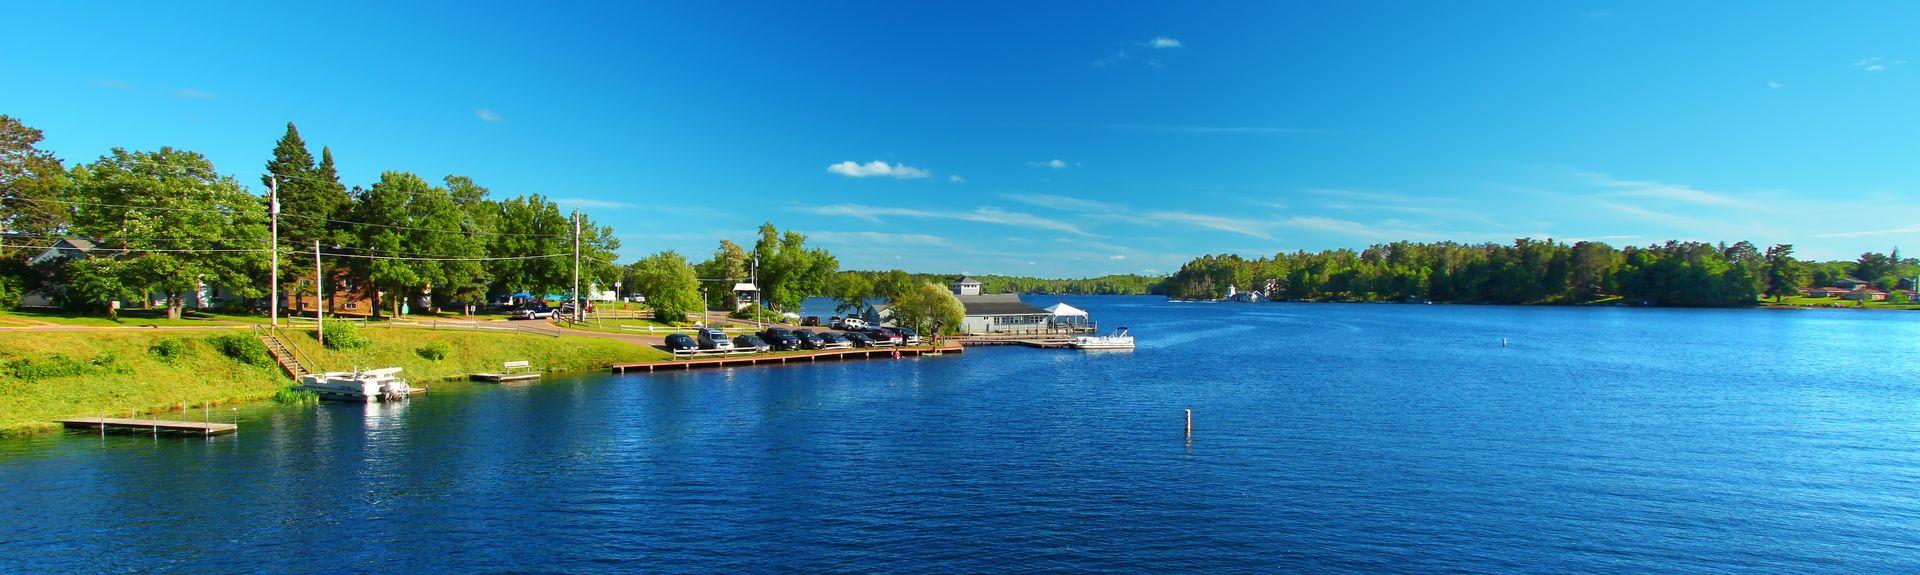 Vrbo | Minocqua, WI Vacation Rentals: cabin rentals & more